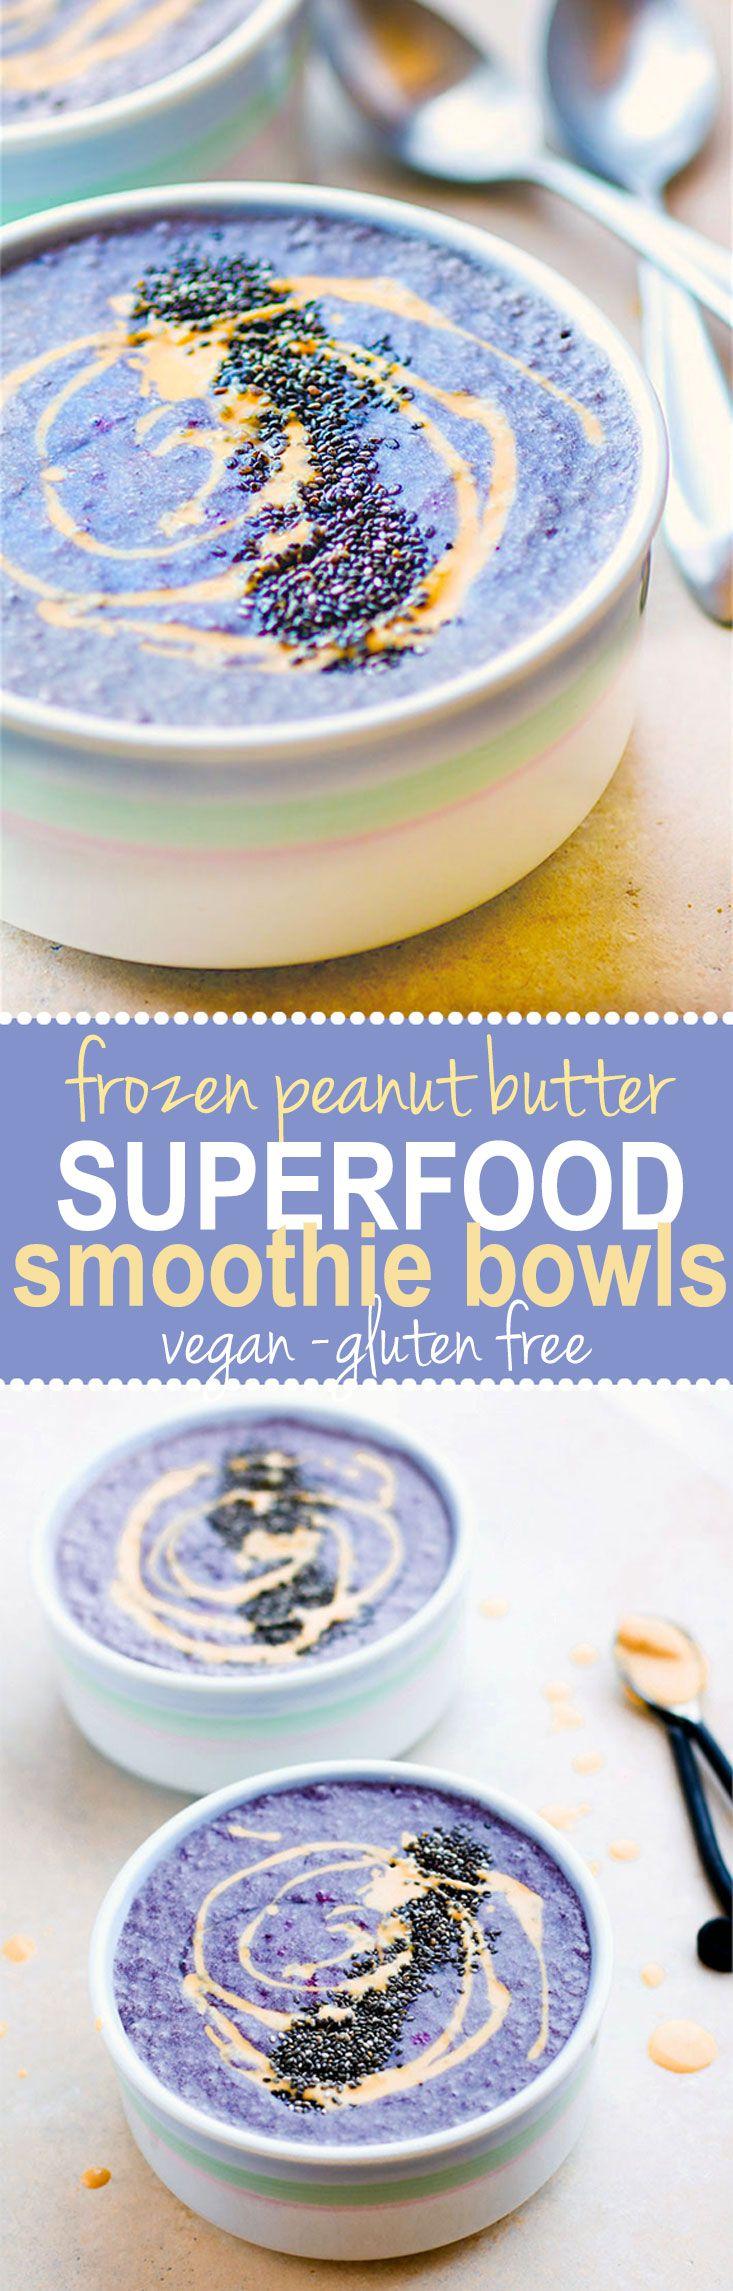 Frozen Peanut Butter SuperFood Smoothie Bowls (Vegan)